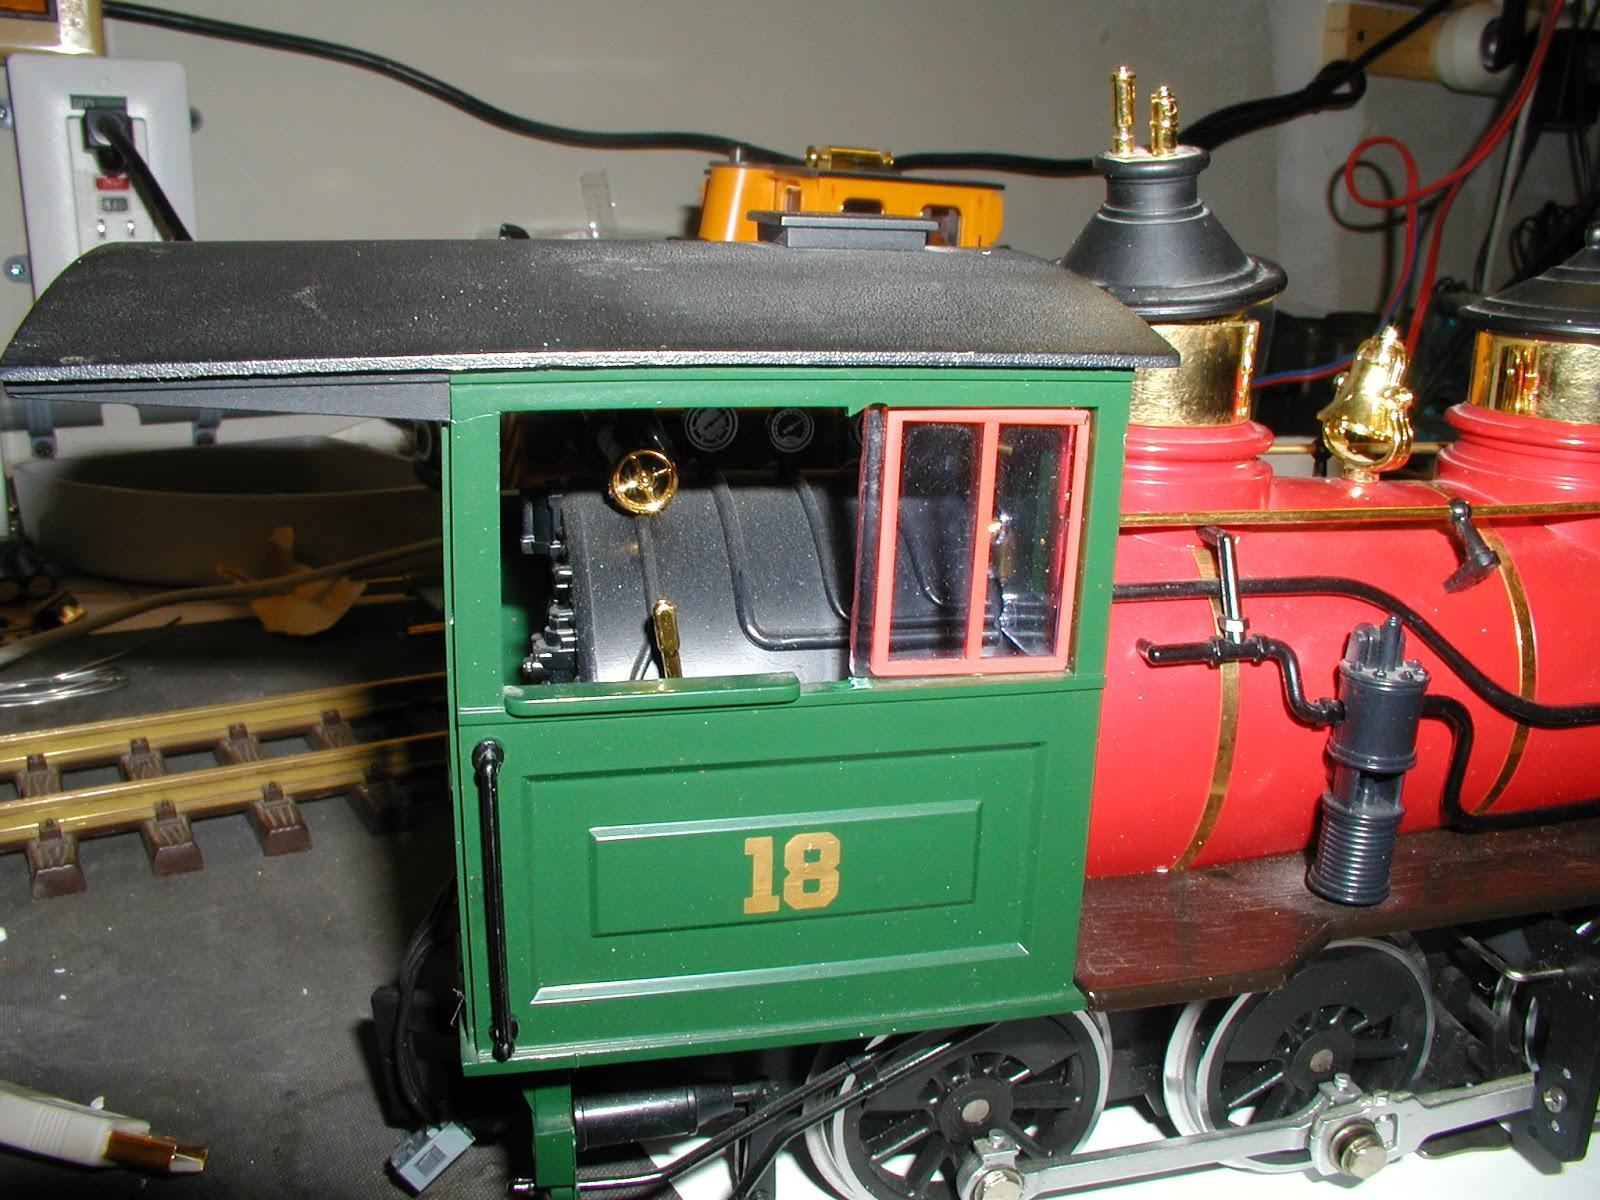 116 best images about Trains on Pinterest | Auto train ...  |Lgb Engine Cow